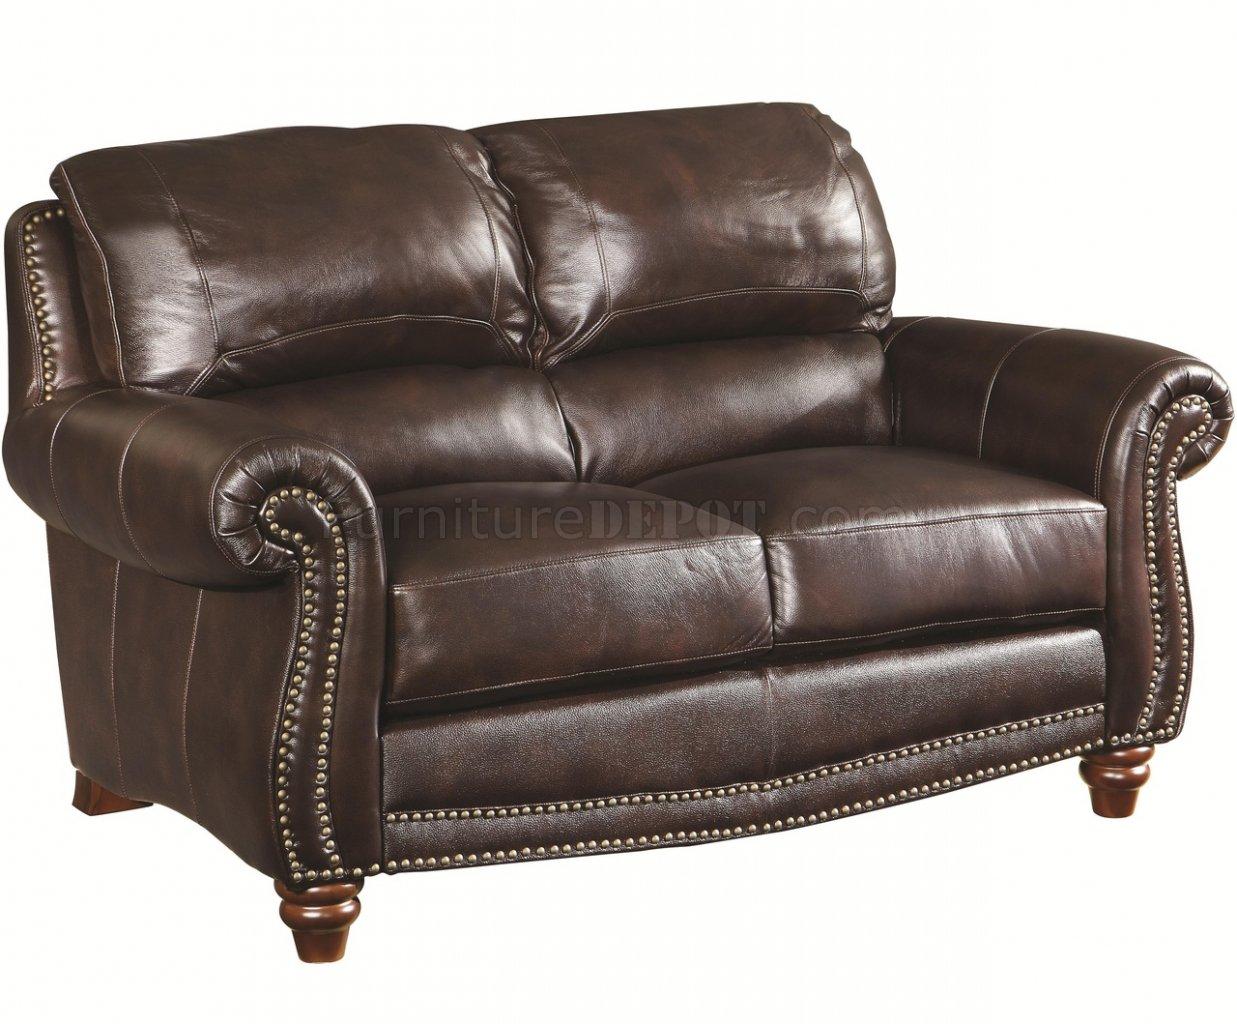 Lockhart Sofa Amp Loveseat 504691 In Burgundy Leather By Coaster